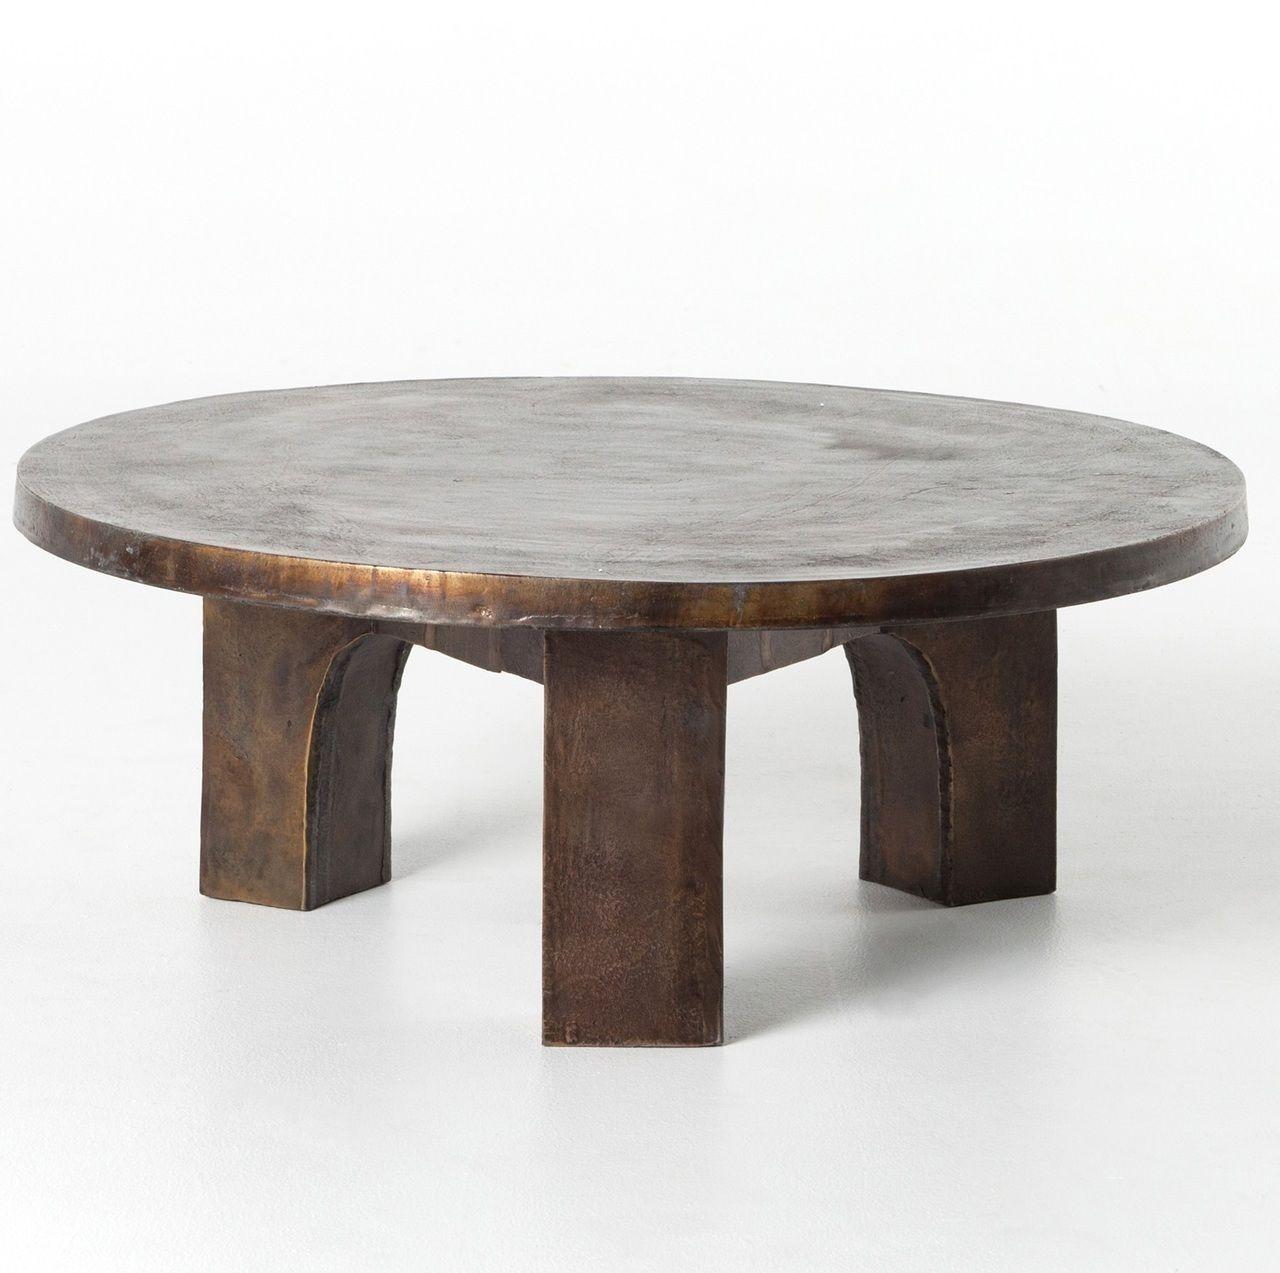 Cruz Round Outdoor Coffee Table Antique Rust In 2021 Coffee Table Outdoor Coffee Tables Round Coffee Table [ 1273 x 1280 Pixel ]